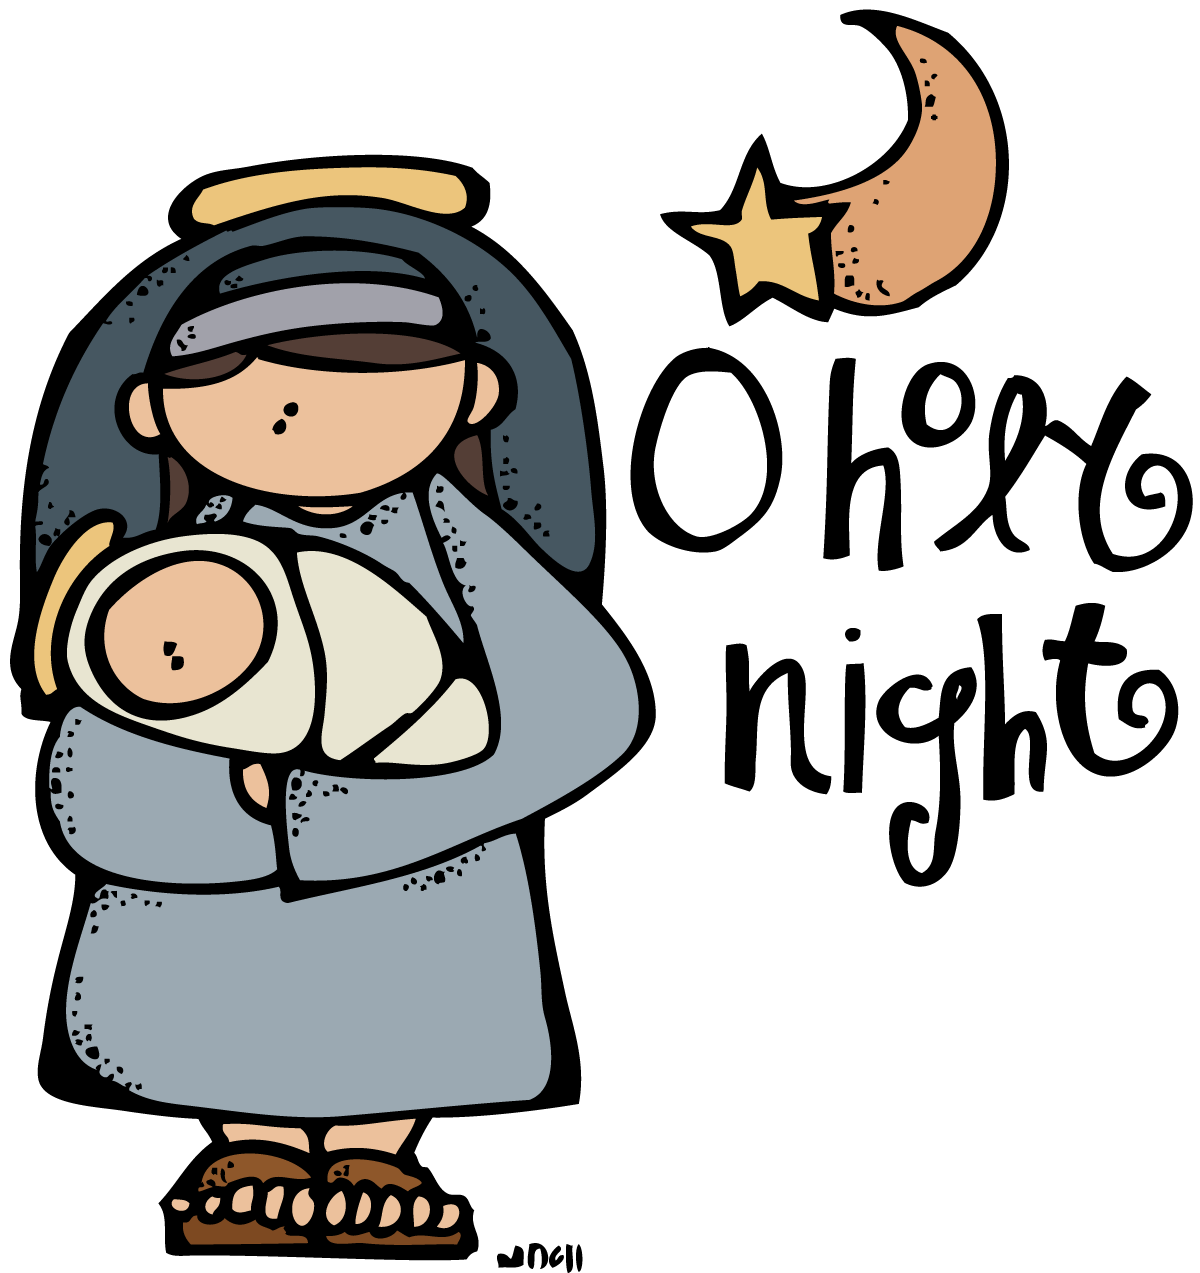 vector free download Holy clipart art lds. Melonheadz illustrating scripture sketch